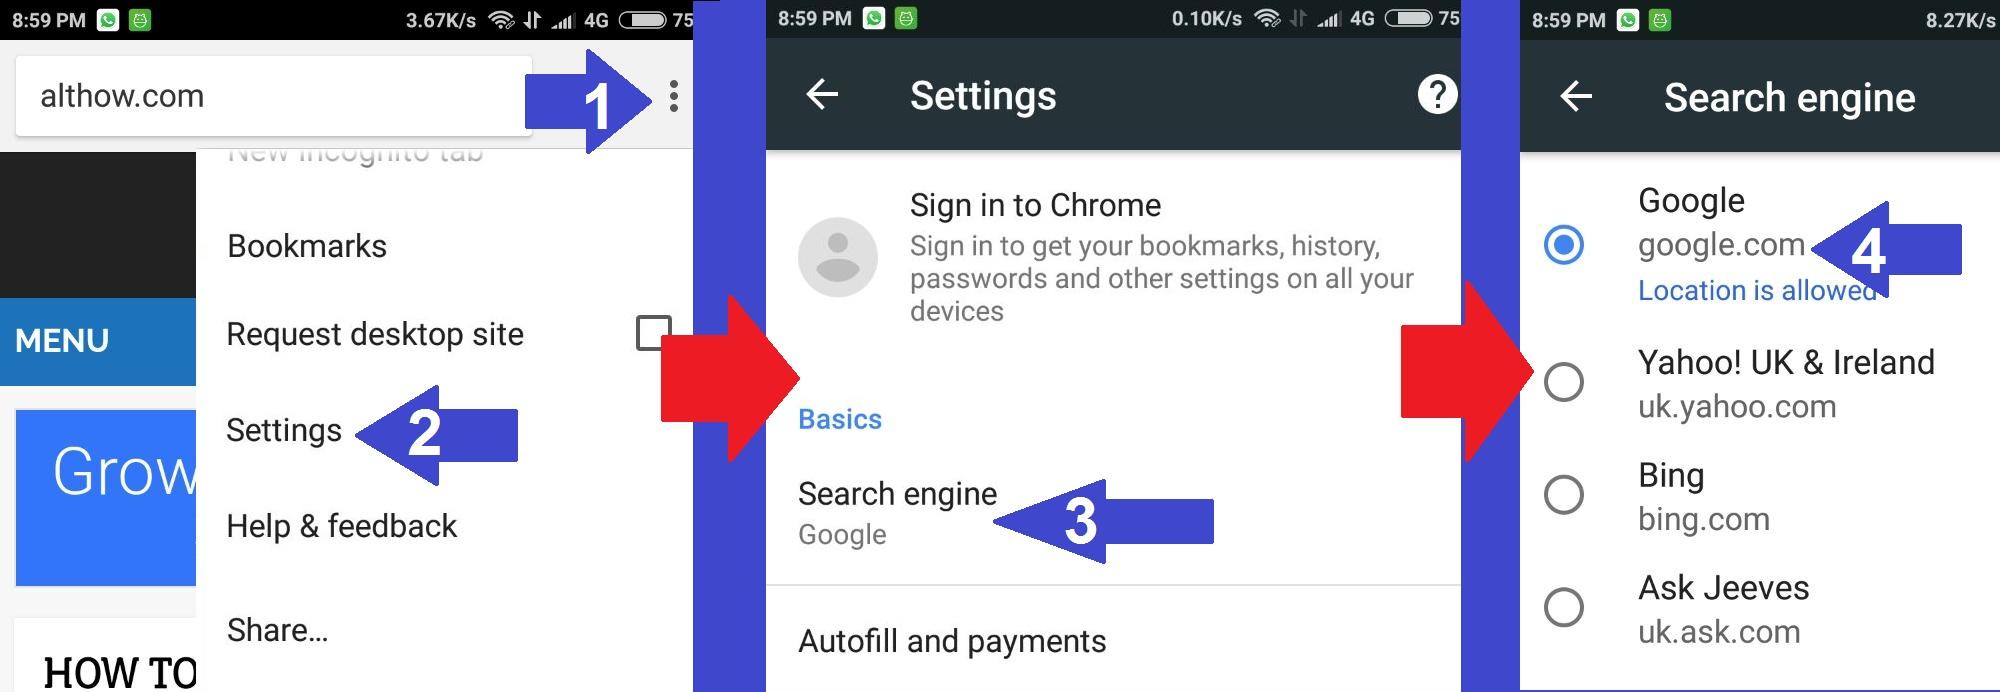 Default Search Engine Chrome Mobile